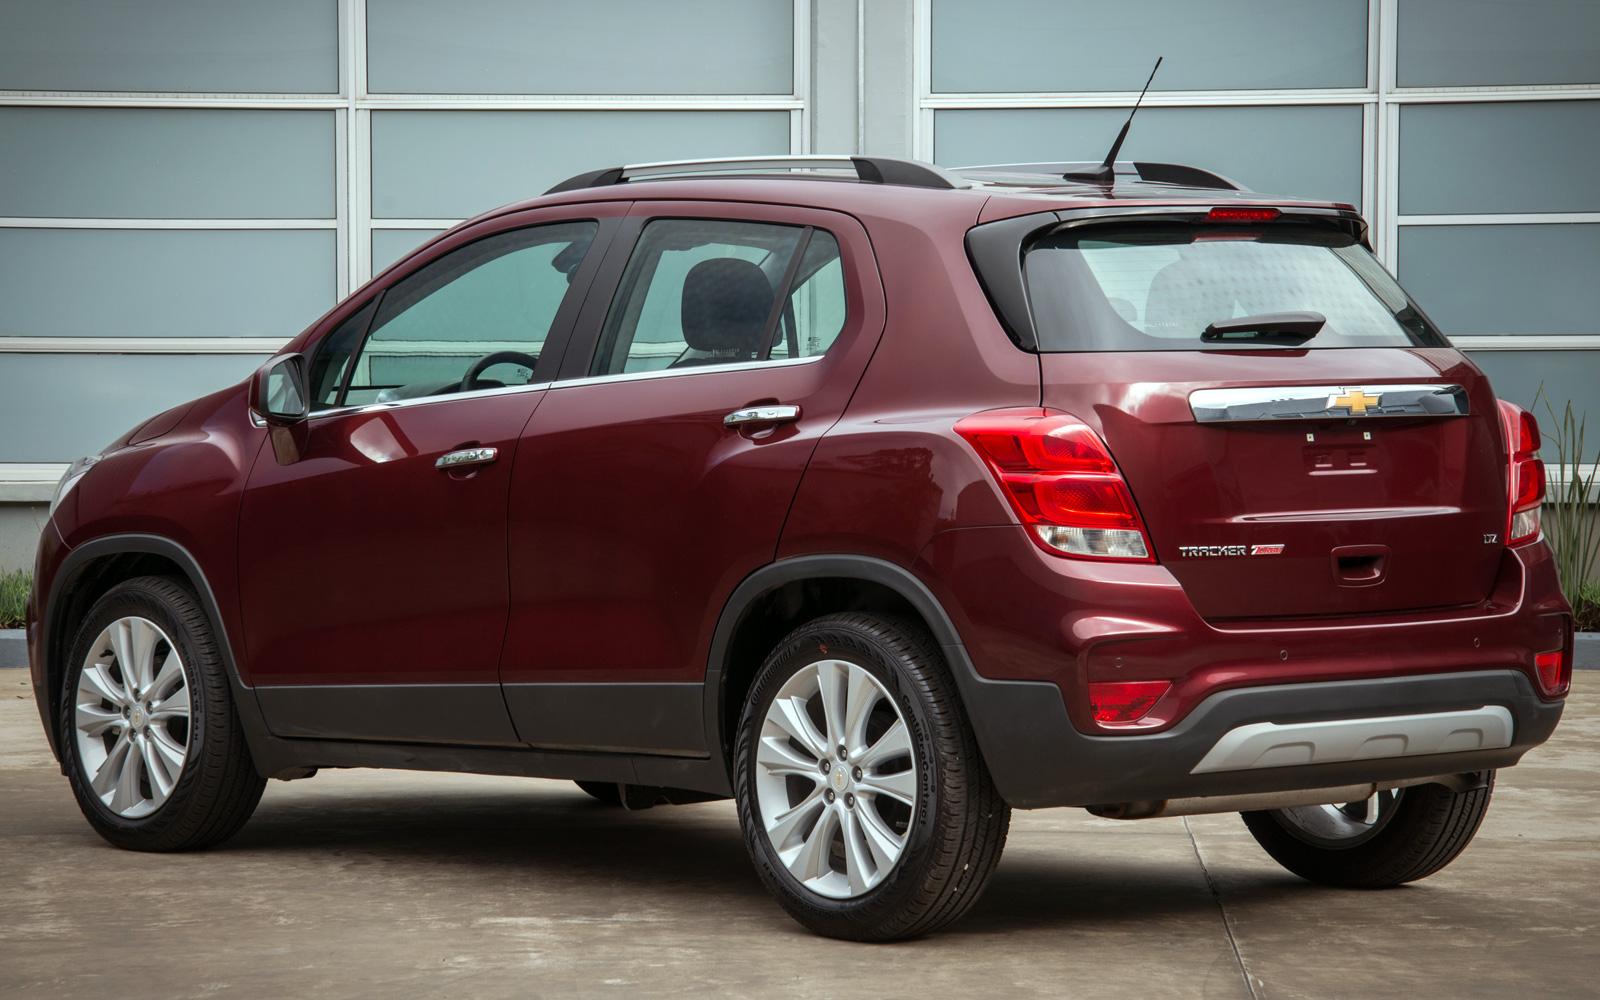 Chevrolet Tracker (2019-2020) цена и характеристики ...